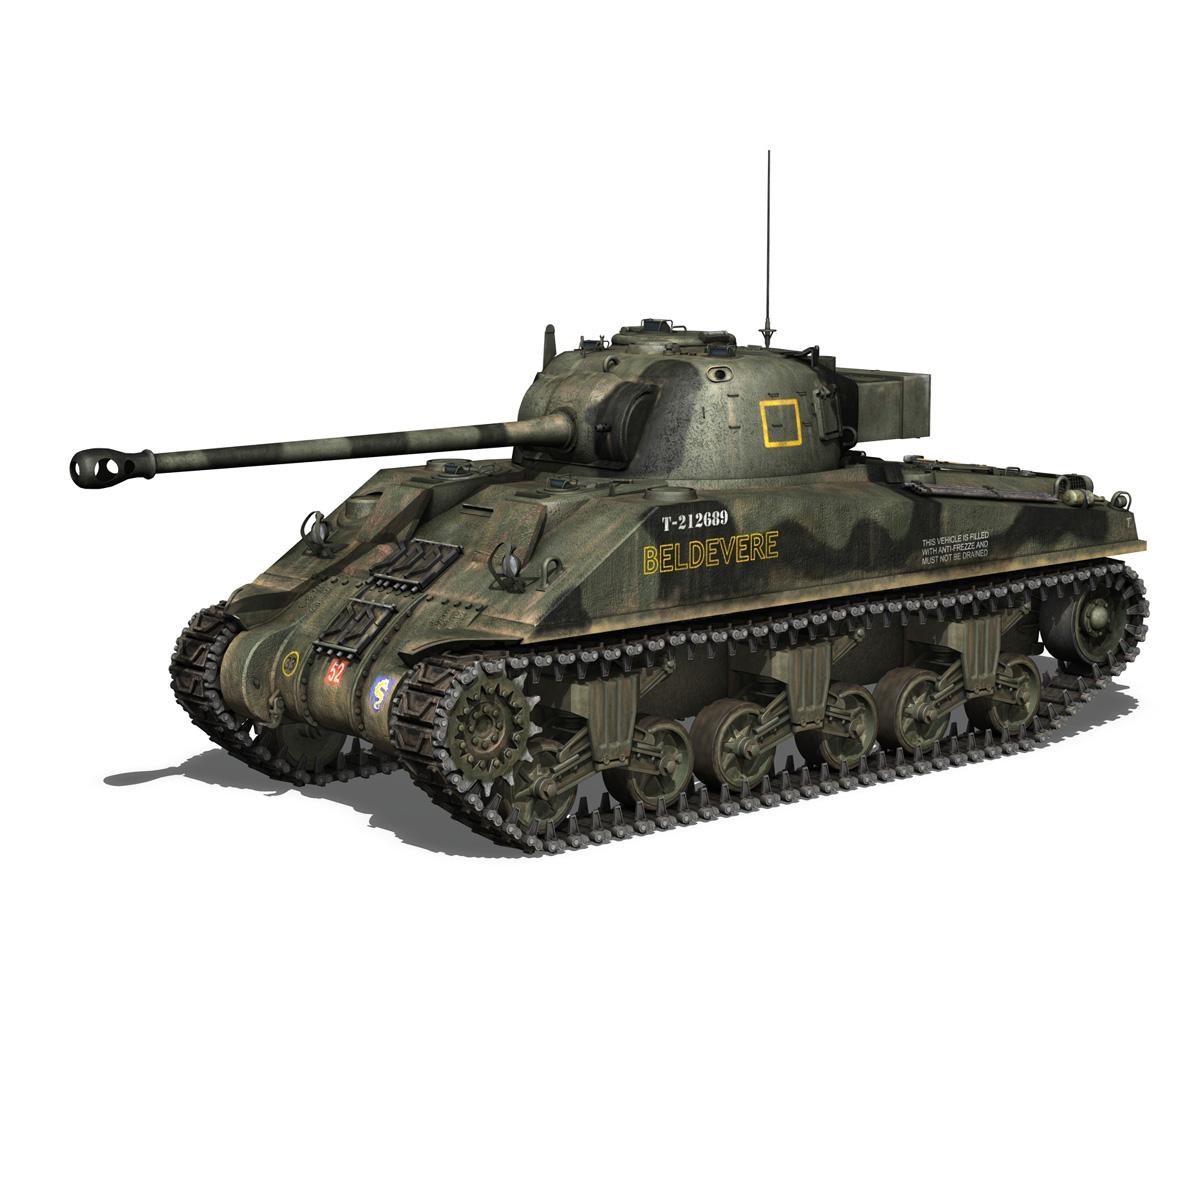 Sherman MK VC Firefly - Beldevere 3d model  266013